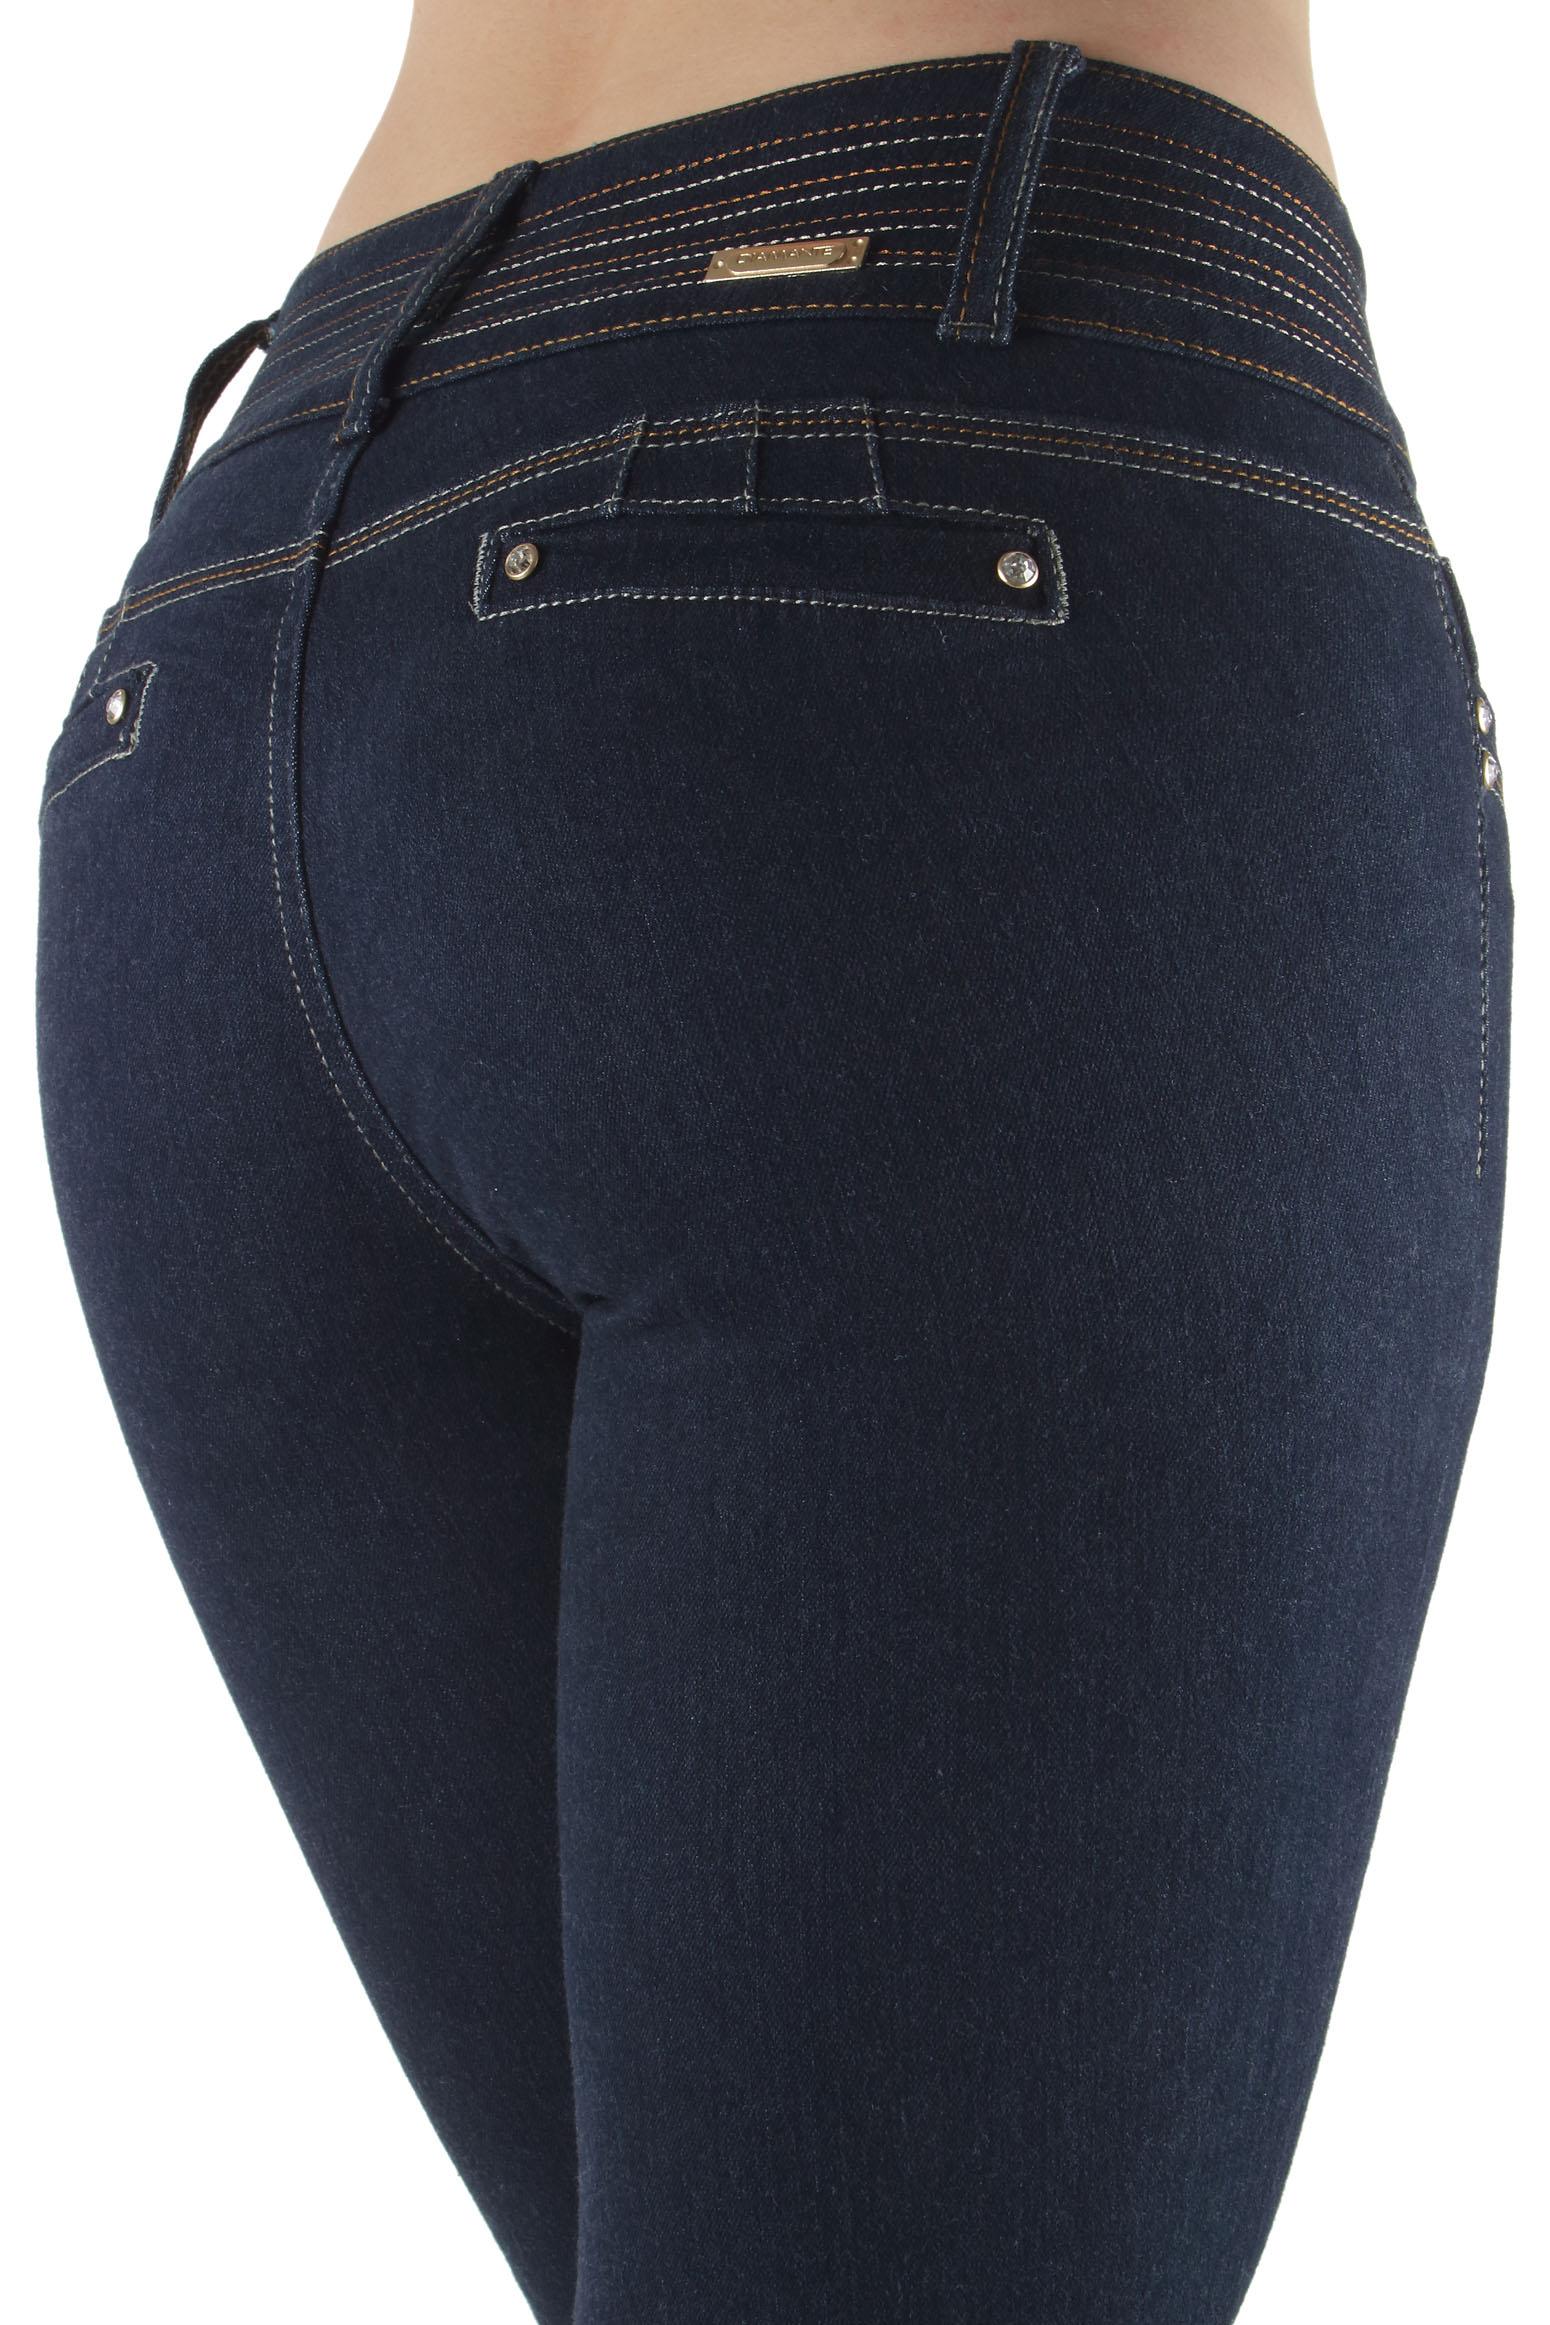 N810SKP - Plus Size, Colombian Design, Butt Lift, Levanta Cola, Skinny Jeans